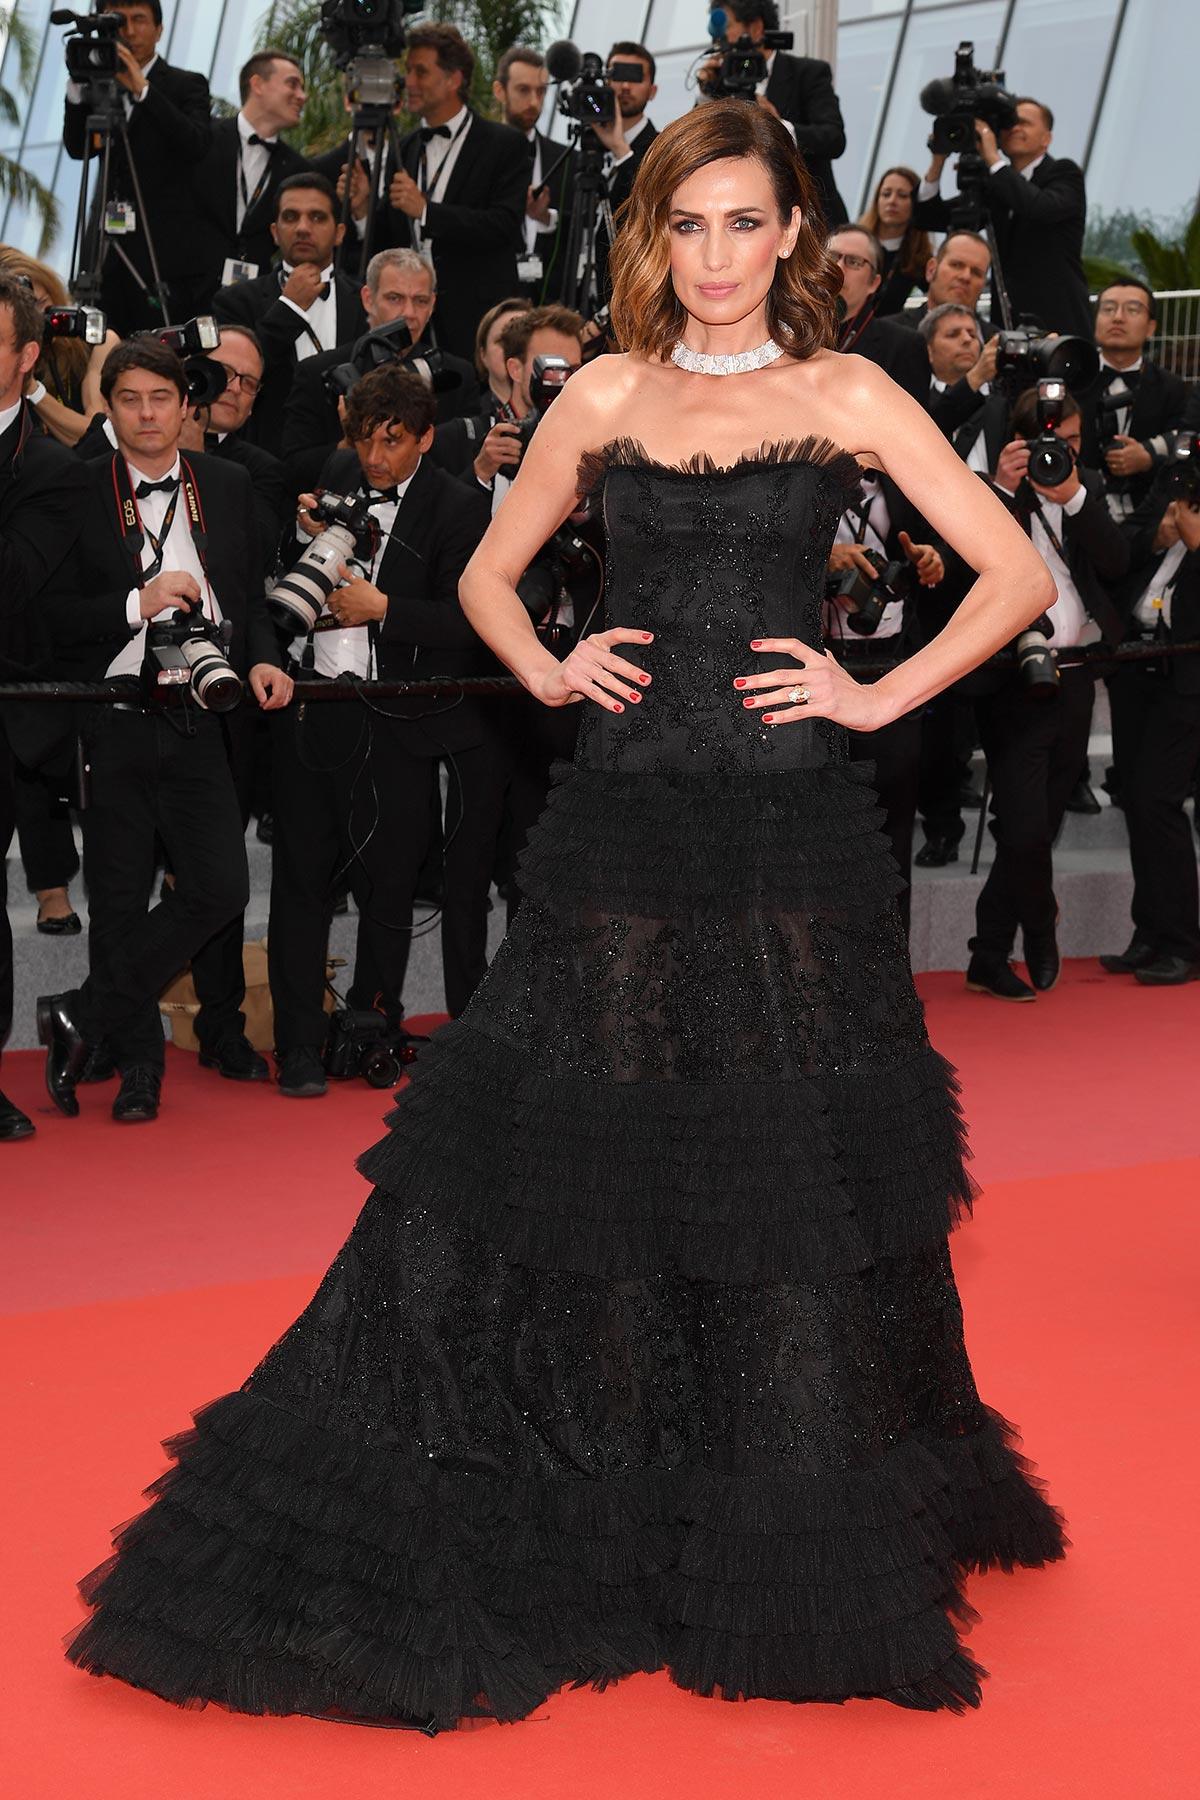 Cannes 2018 - Red carpet - Nieves Alvarez - Hair and makeup Luigi Rizzello per Massimo Serini